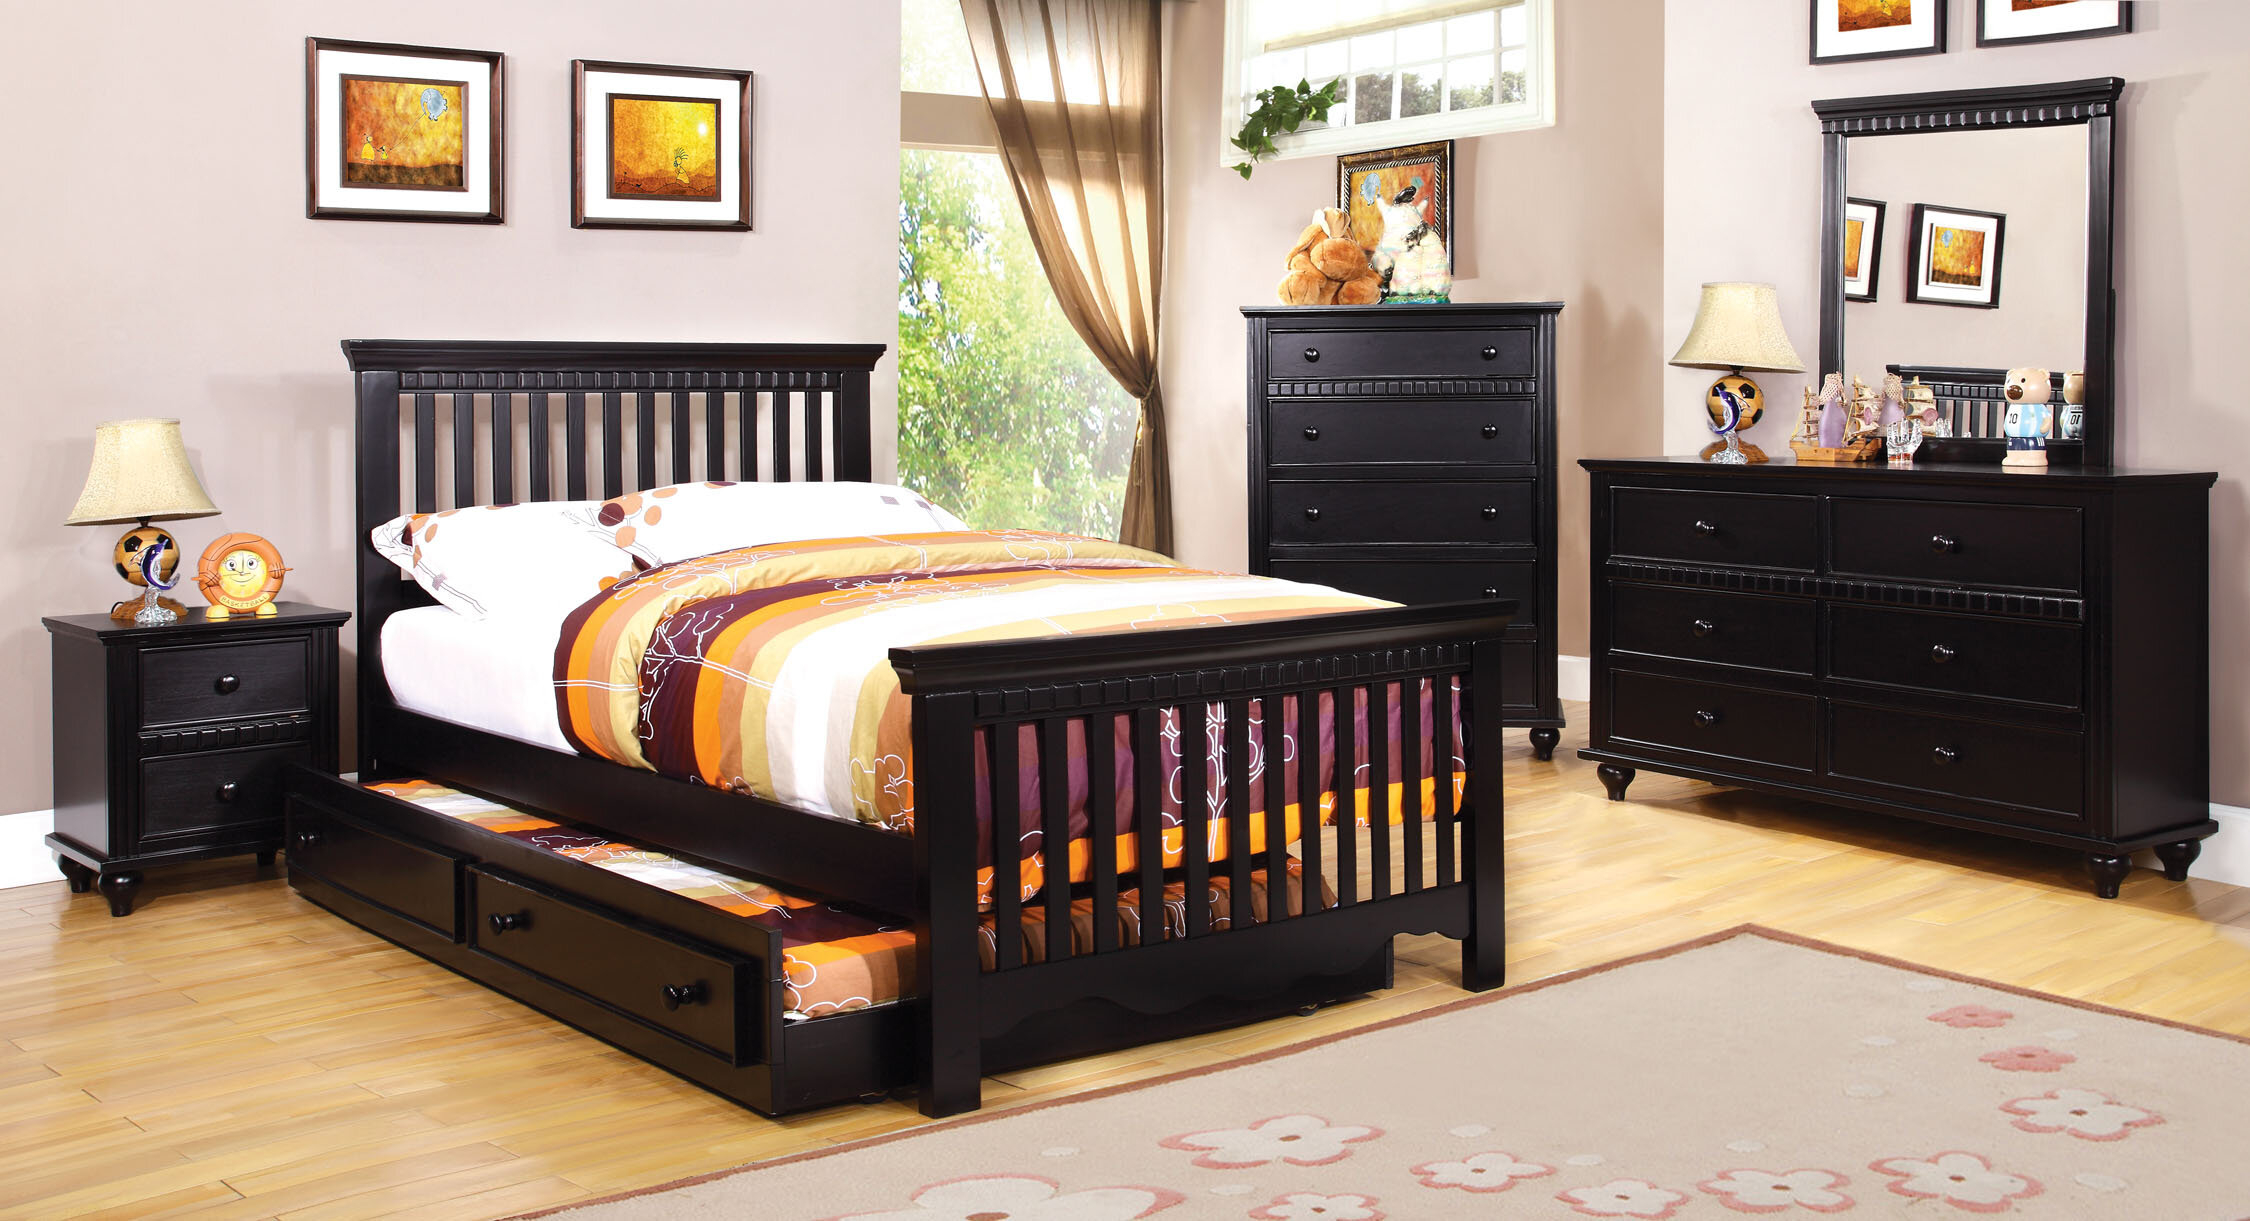 Castillian Cottage Style Black Finish Full Size Bed Frame Set W/ Trundle